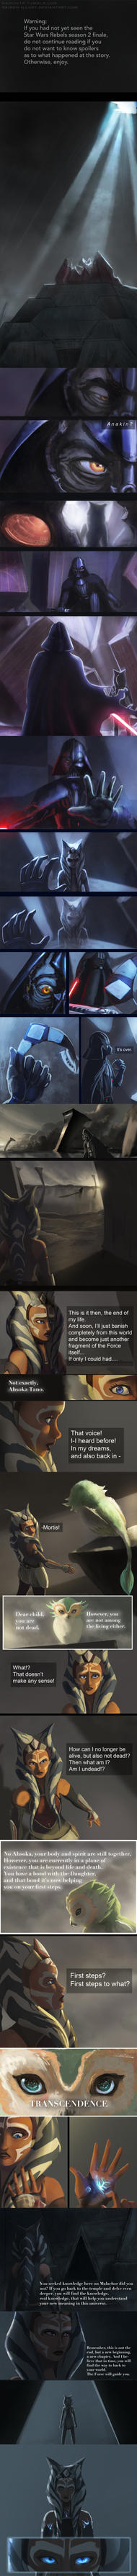 Fulcrum's Fate by Raikoh-illust